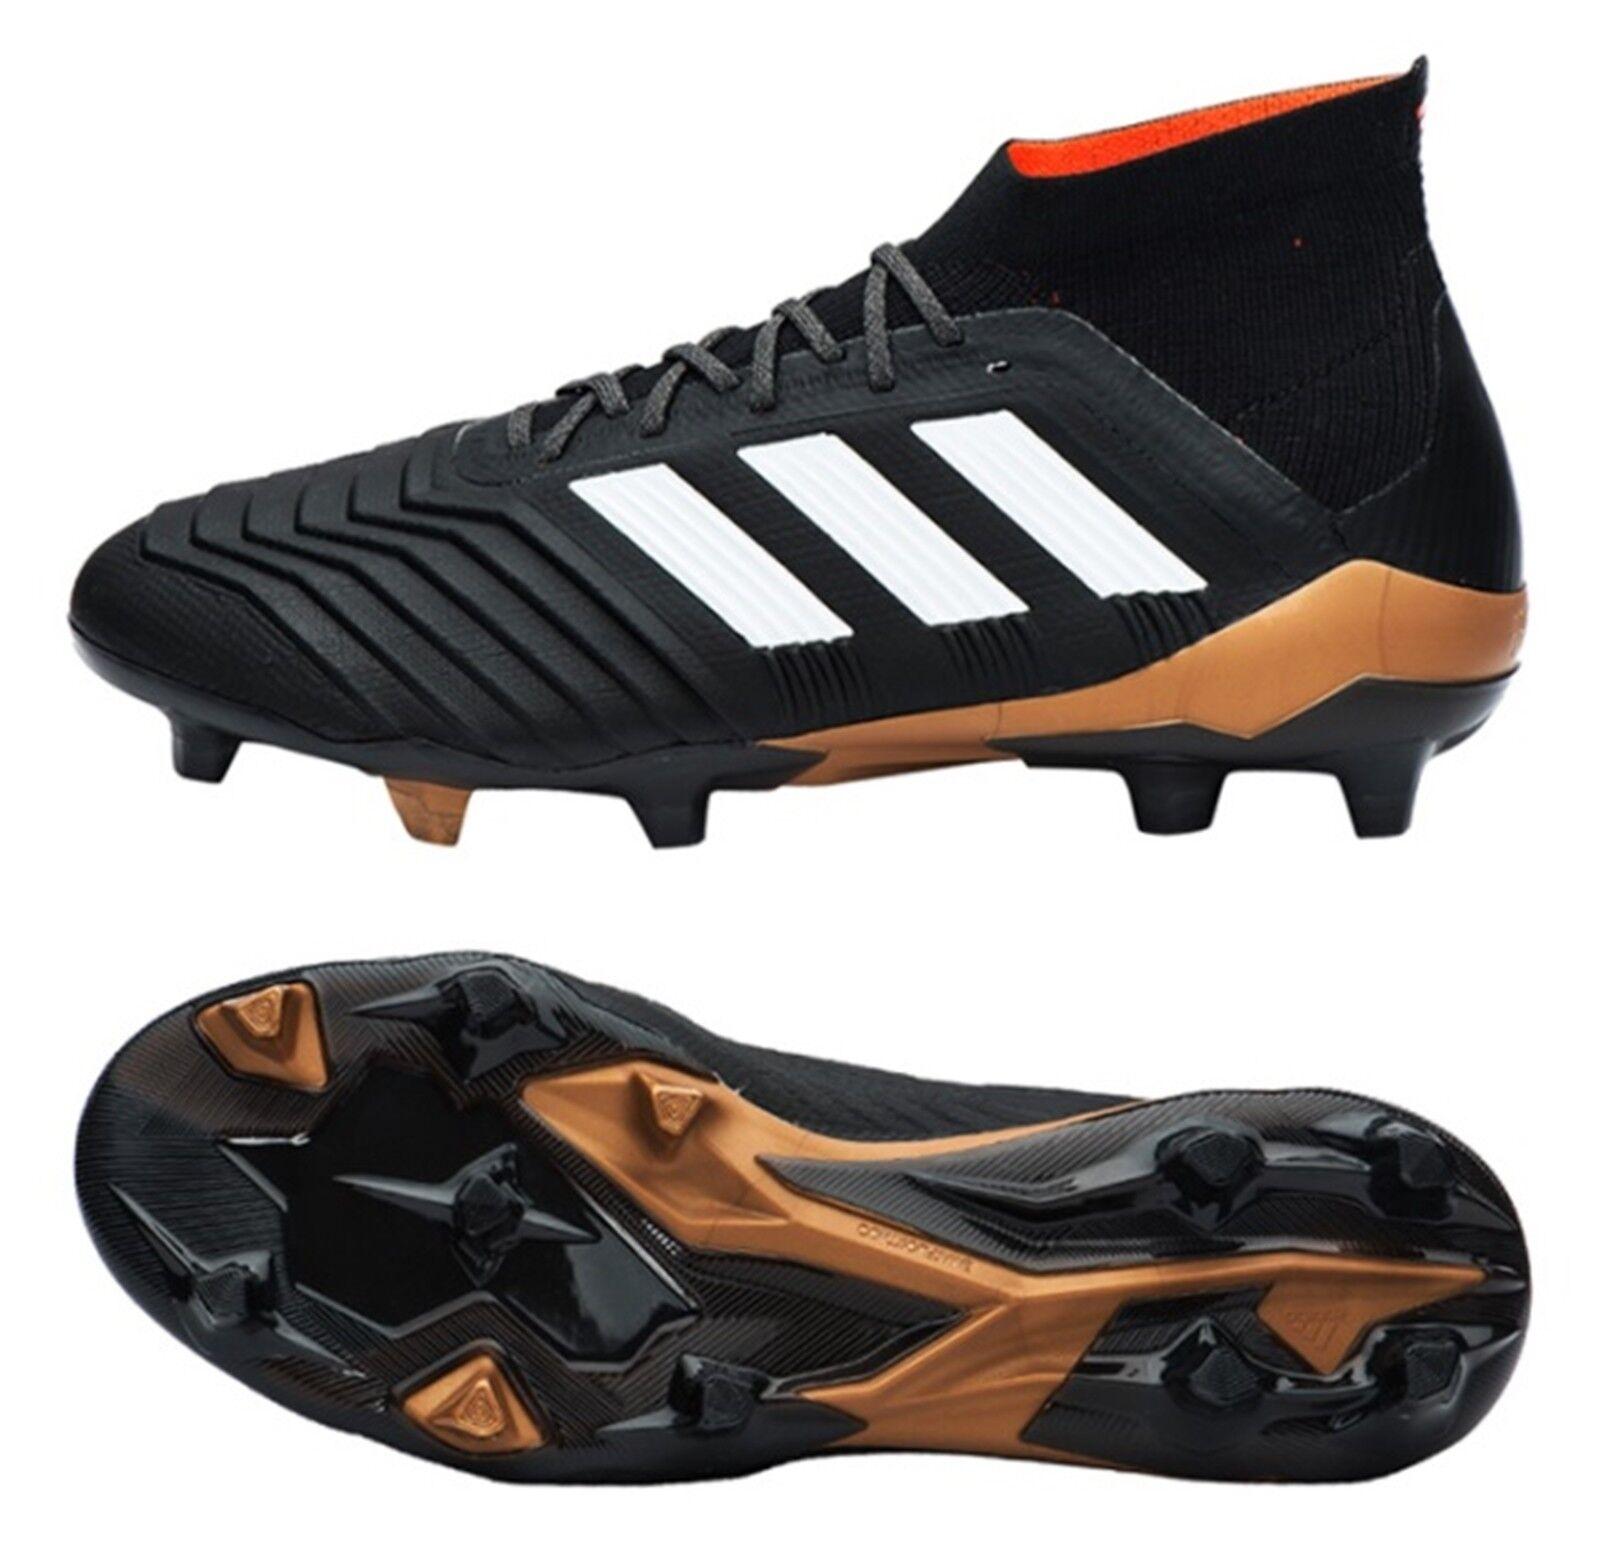 Adidas Hombres Projoator 18.1 FG Botines De Fútbol Fútbol Negro Gimnasio Zapatos Spike BB6354